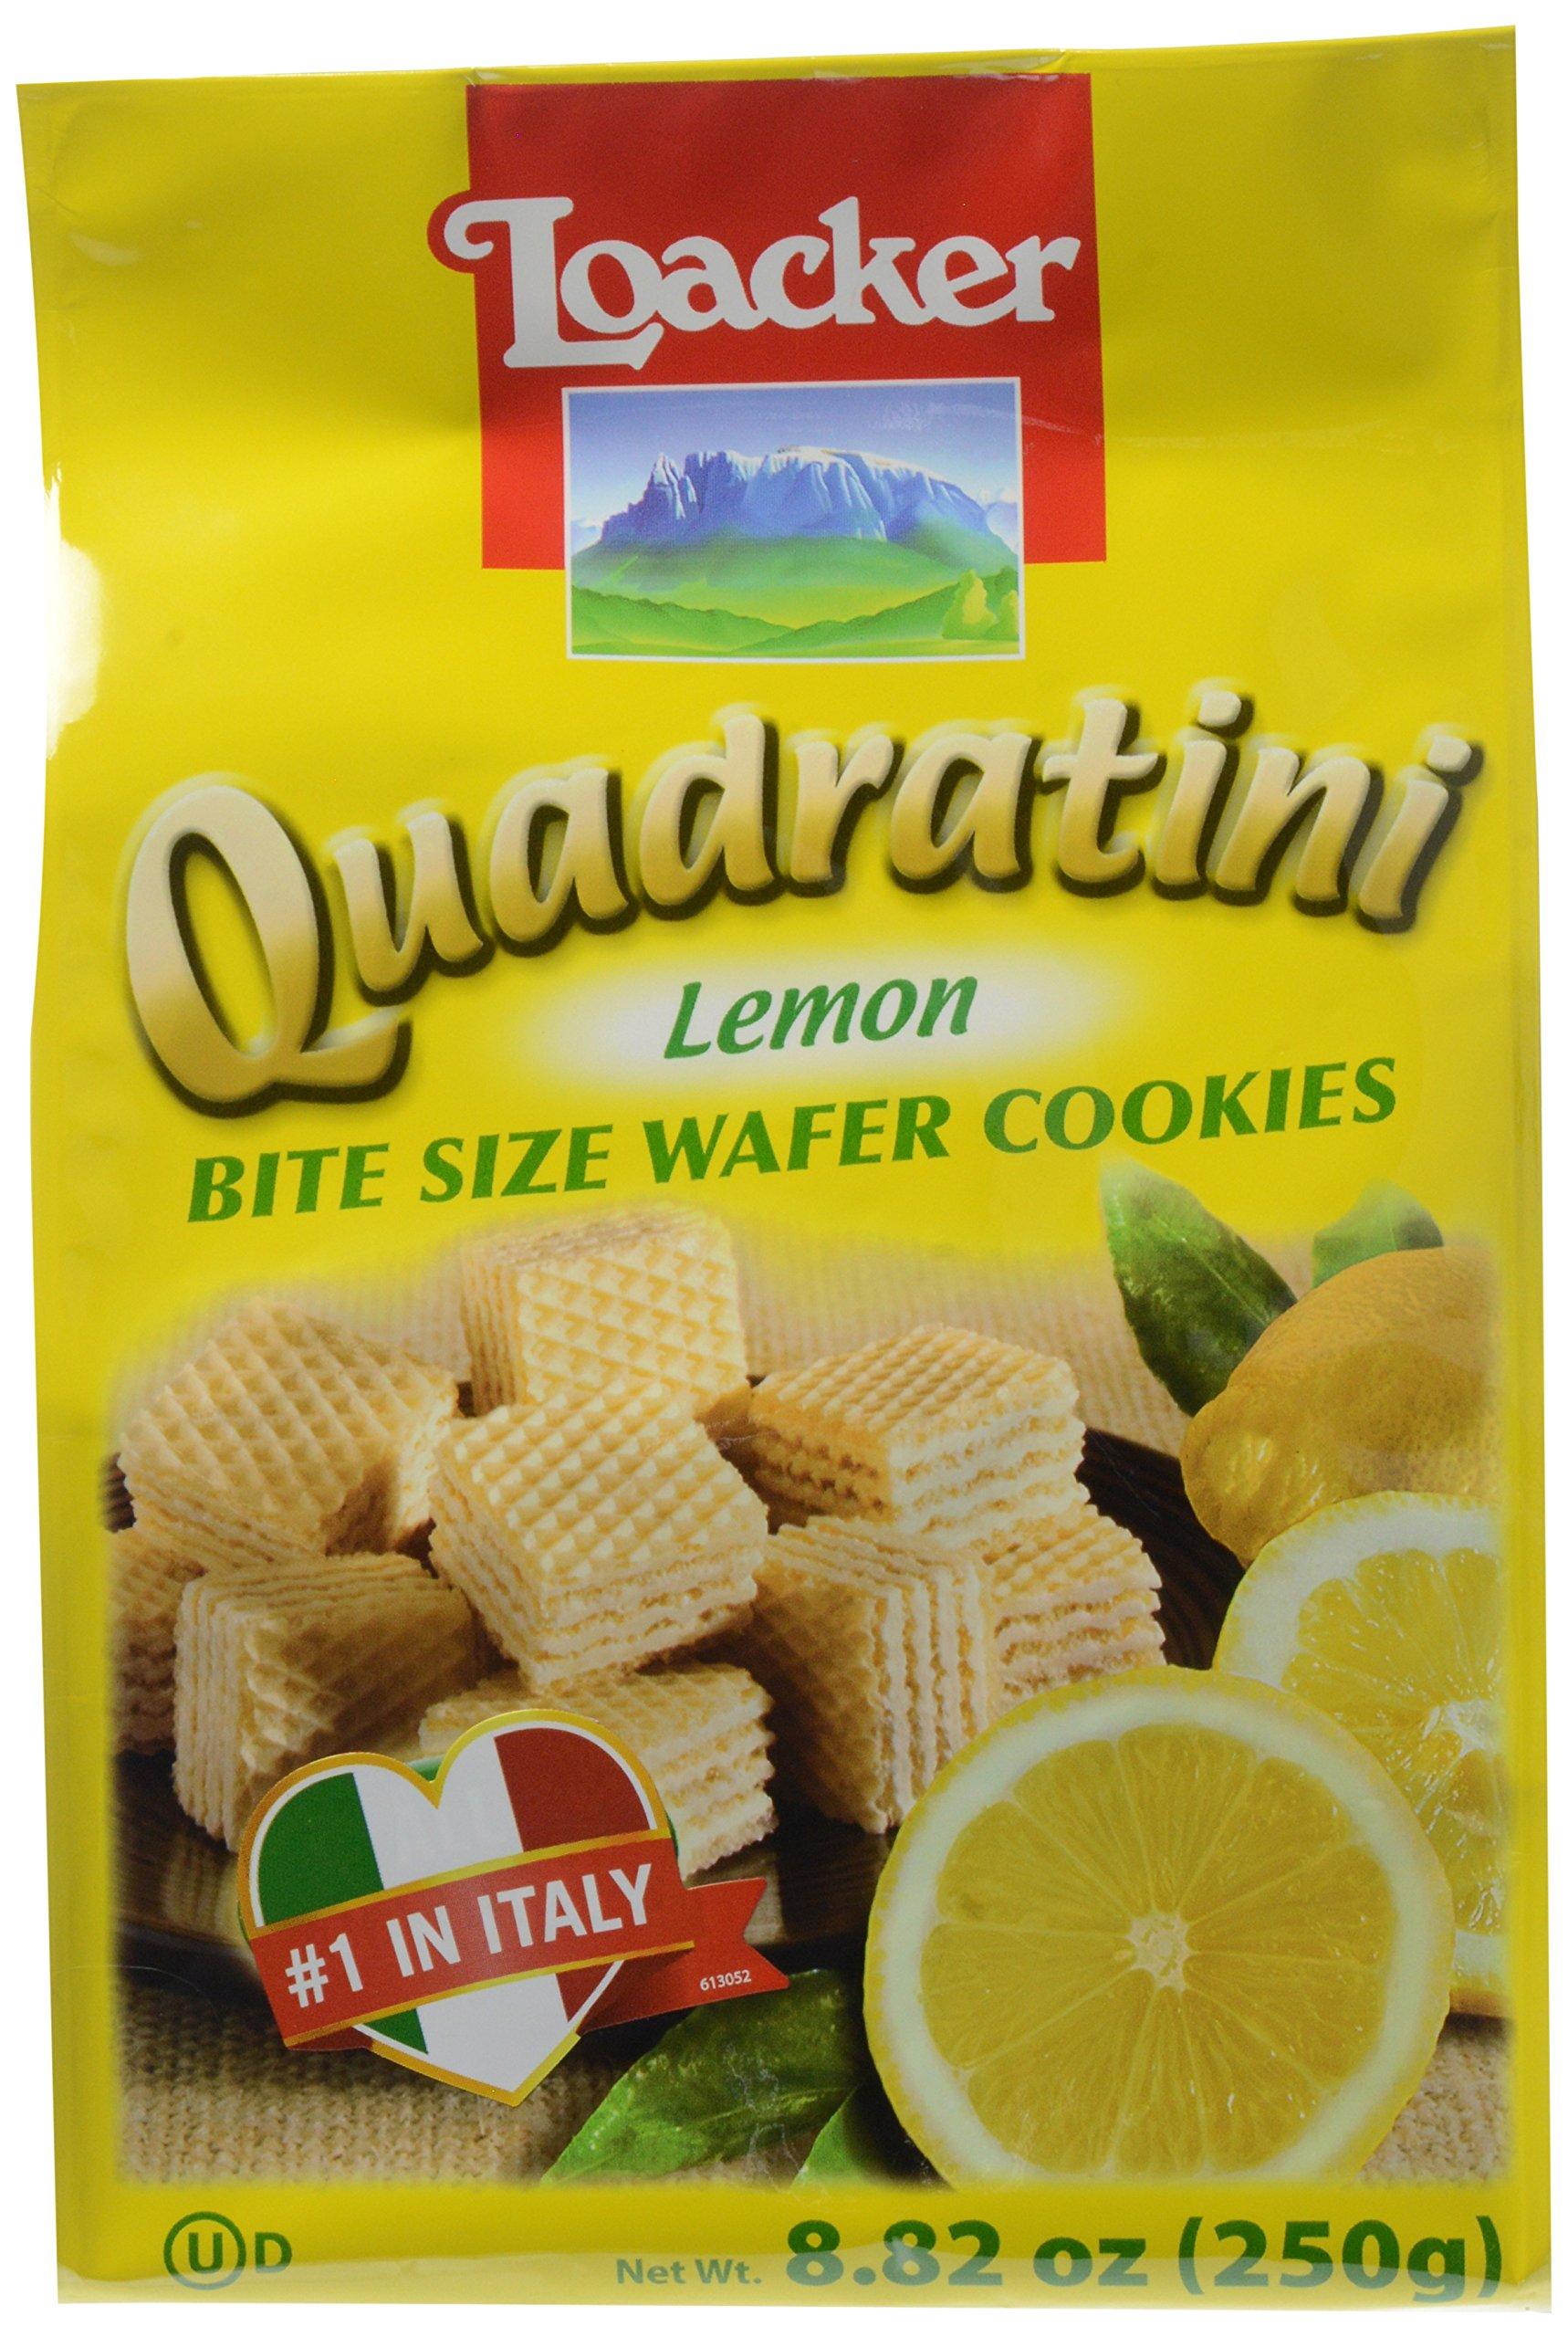 Loacker Quadratini Wafer Cookies - Lemon - 8.82 oz